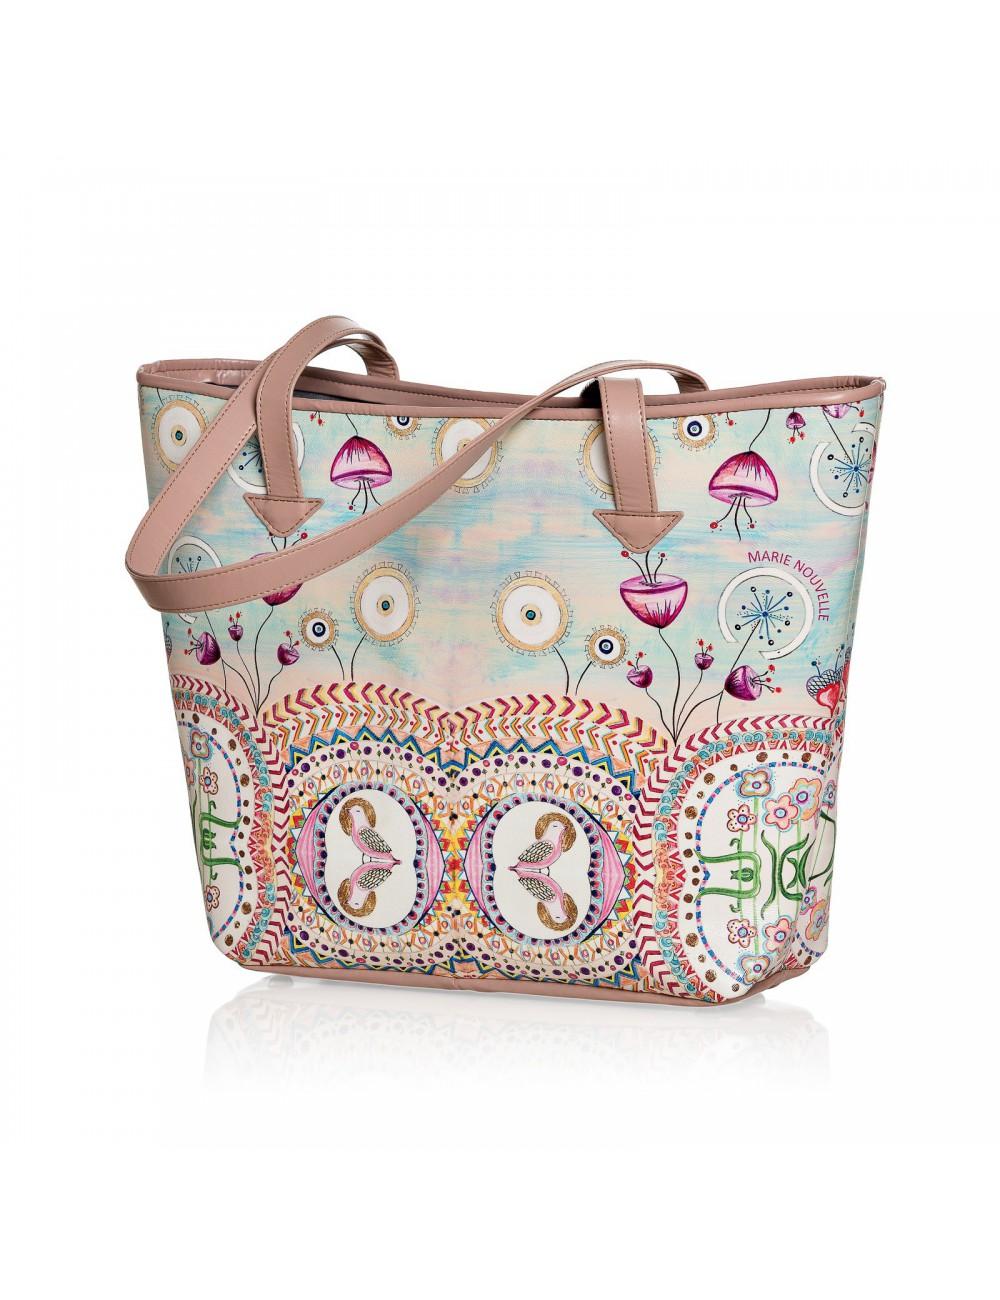 Happy Hills printed Bag